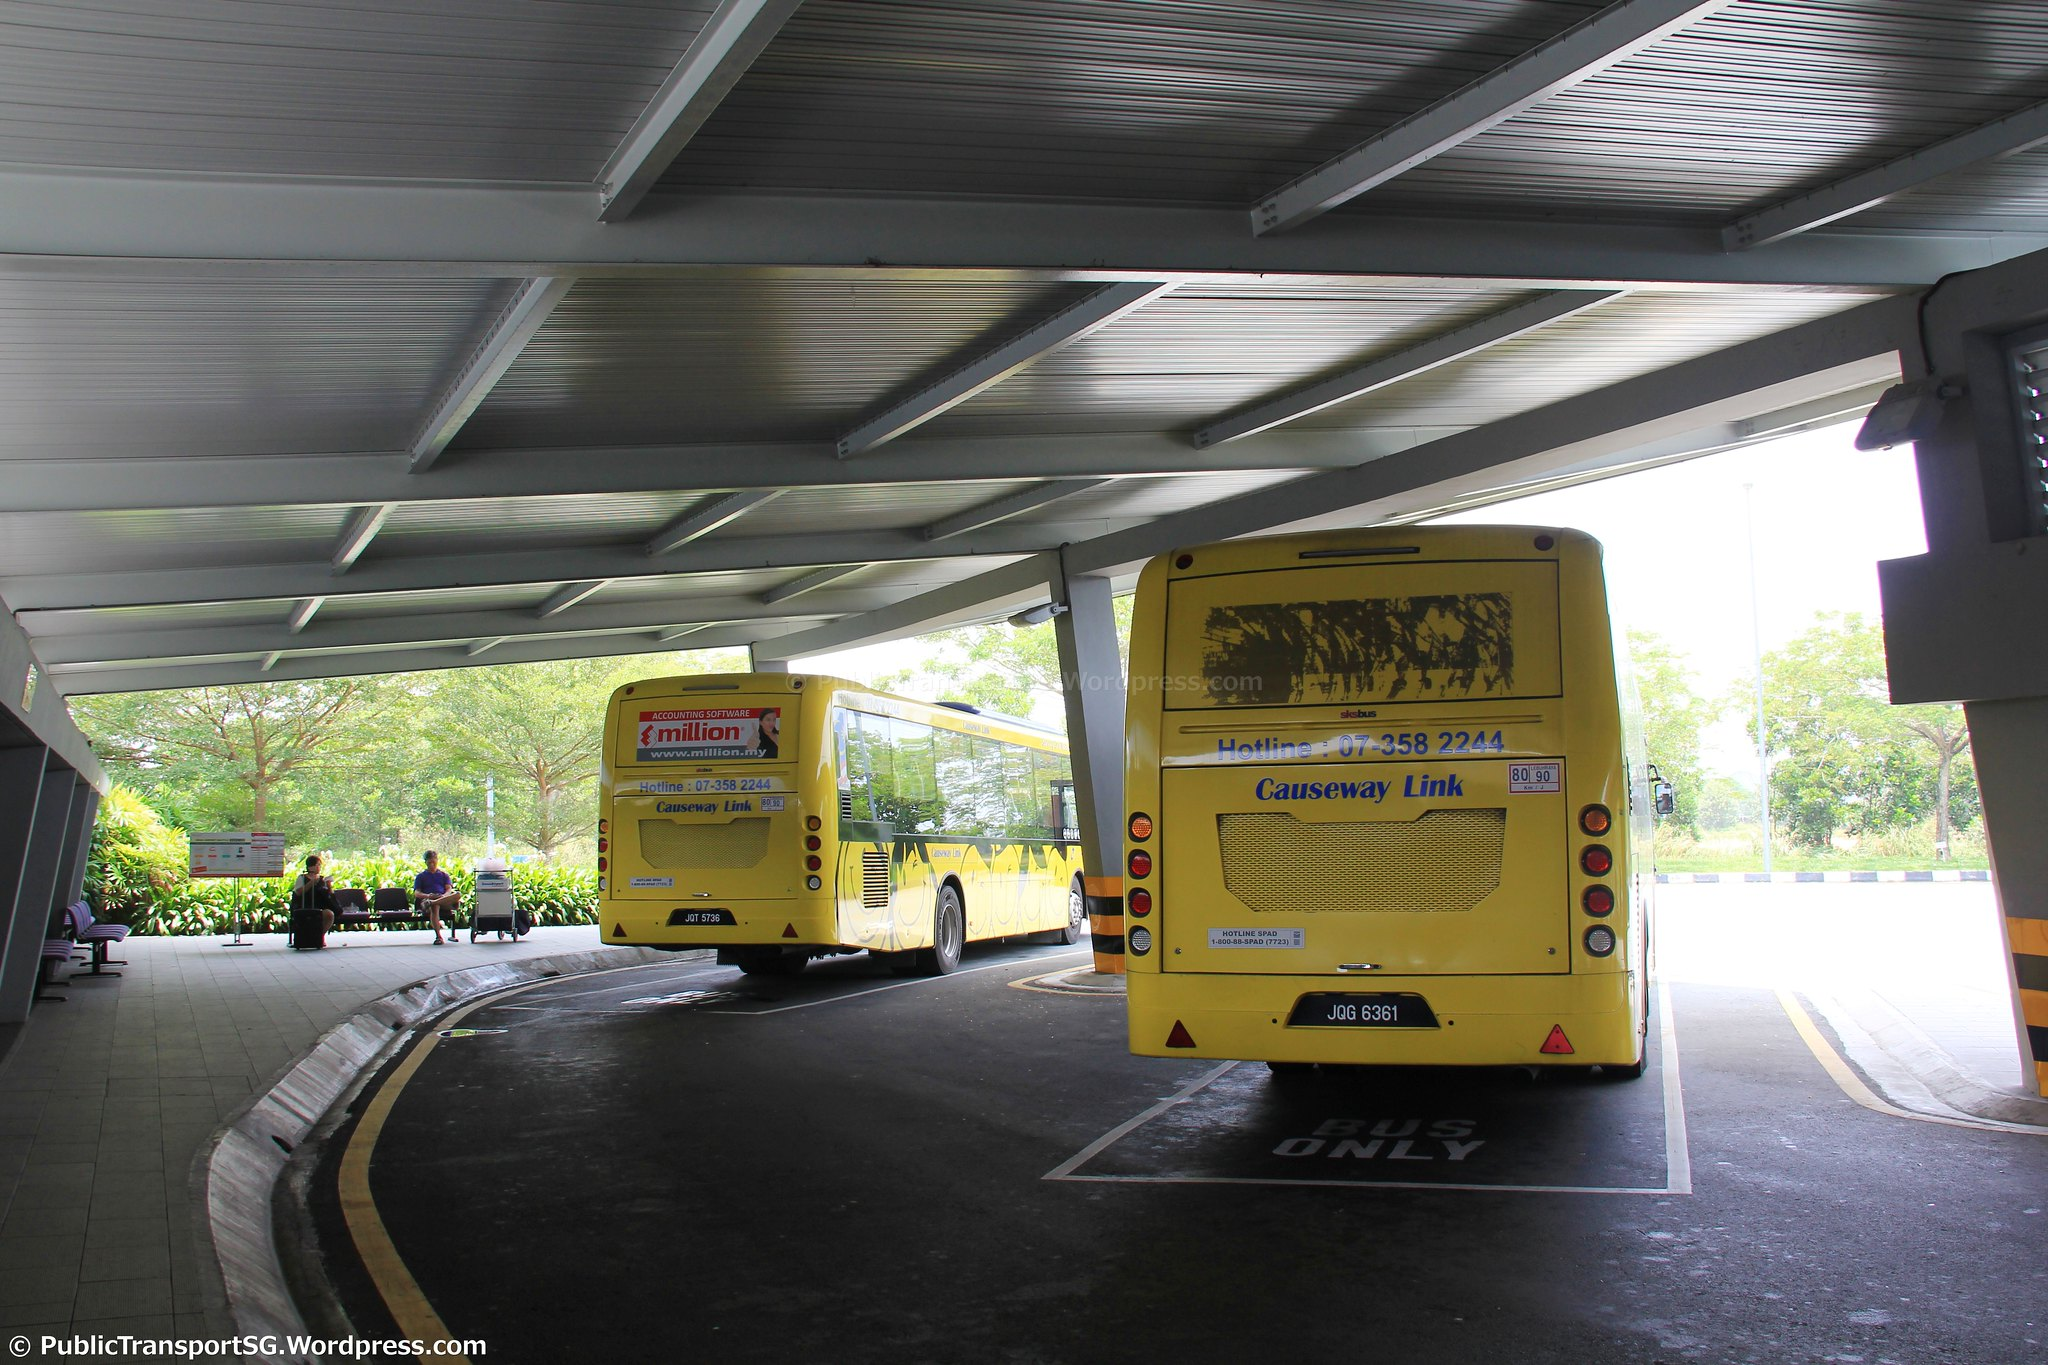 A1 Airport Parking >> JB Bus Terminals | Public Transport SG